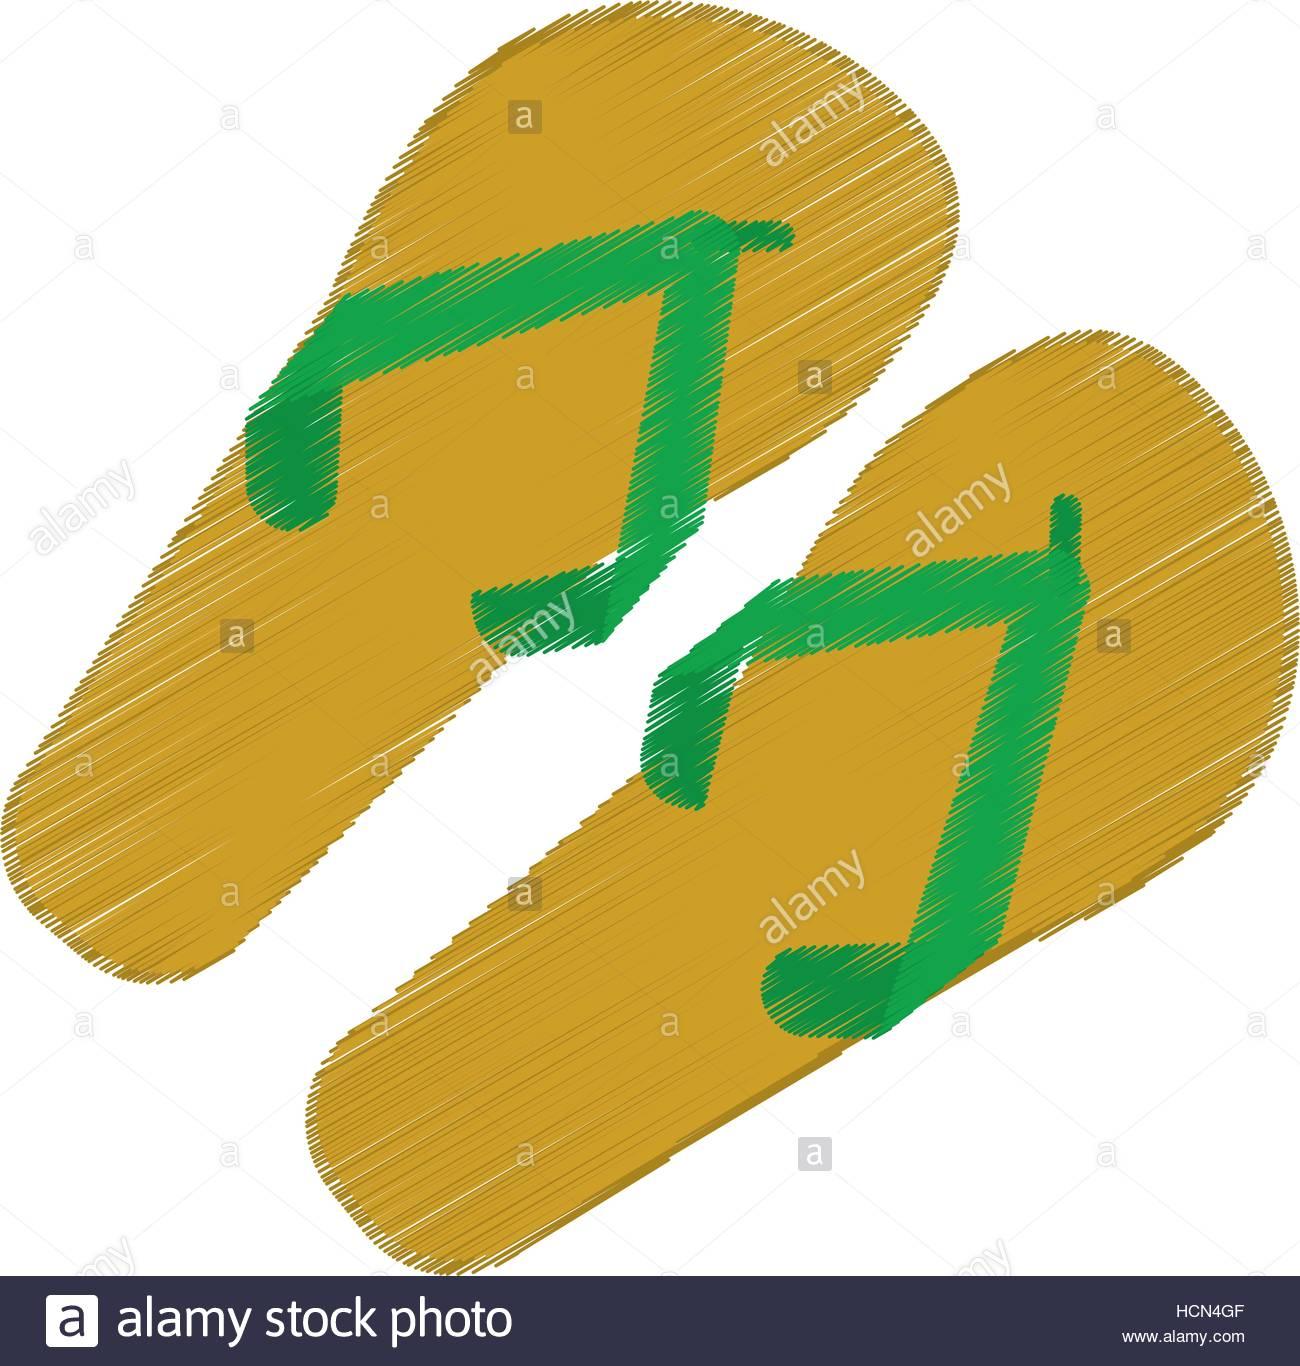 1300x1366 Drawing Green And Yellow Flip Flop Brasilian Stock Vector Art